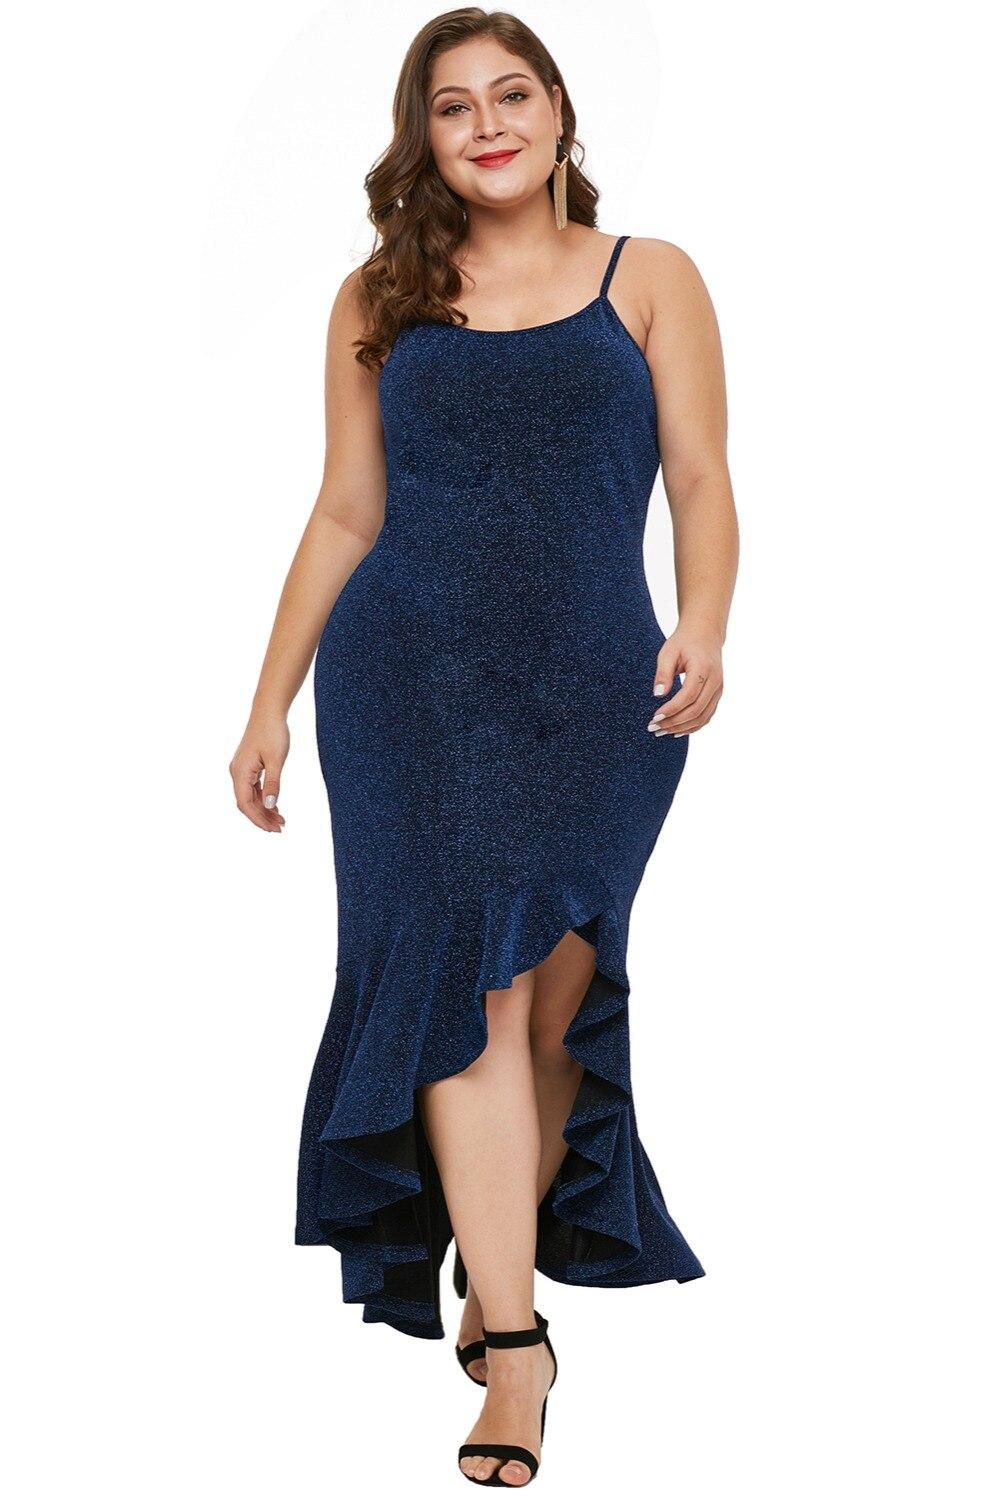 Navy-Blue-True-Shine-Plus-Size-High-low-Dress-LC610939-5-4